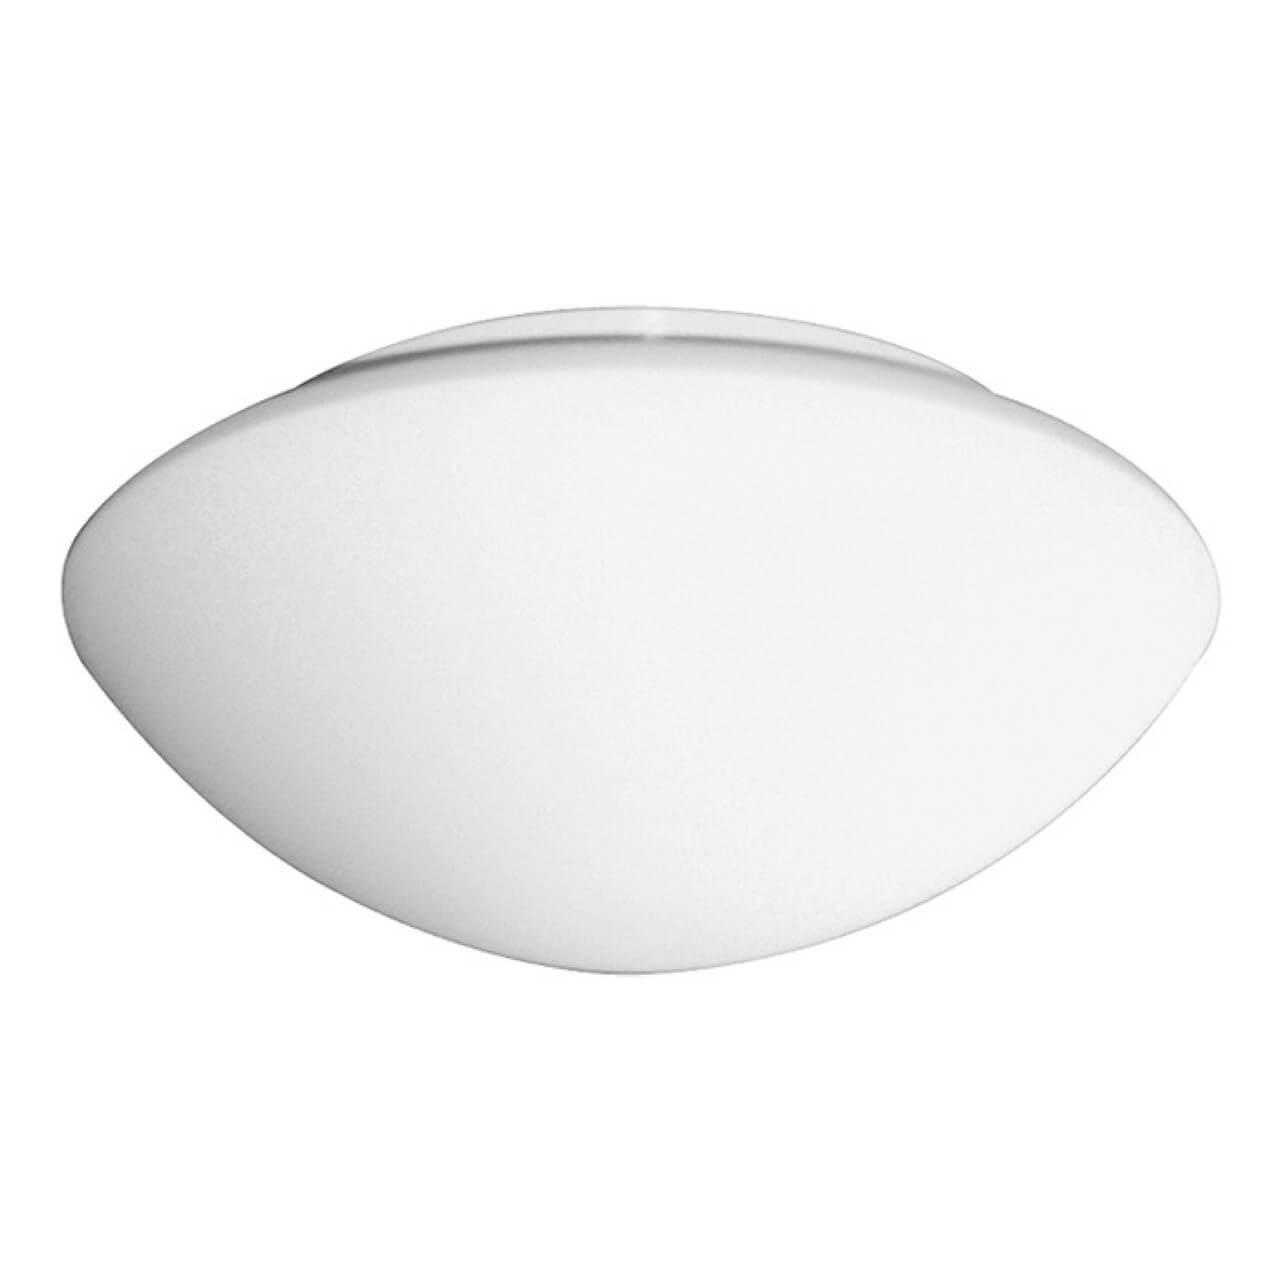 Накладной светильник Arte Lamp A7930AP-2WH, E27, 60 Вт цена